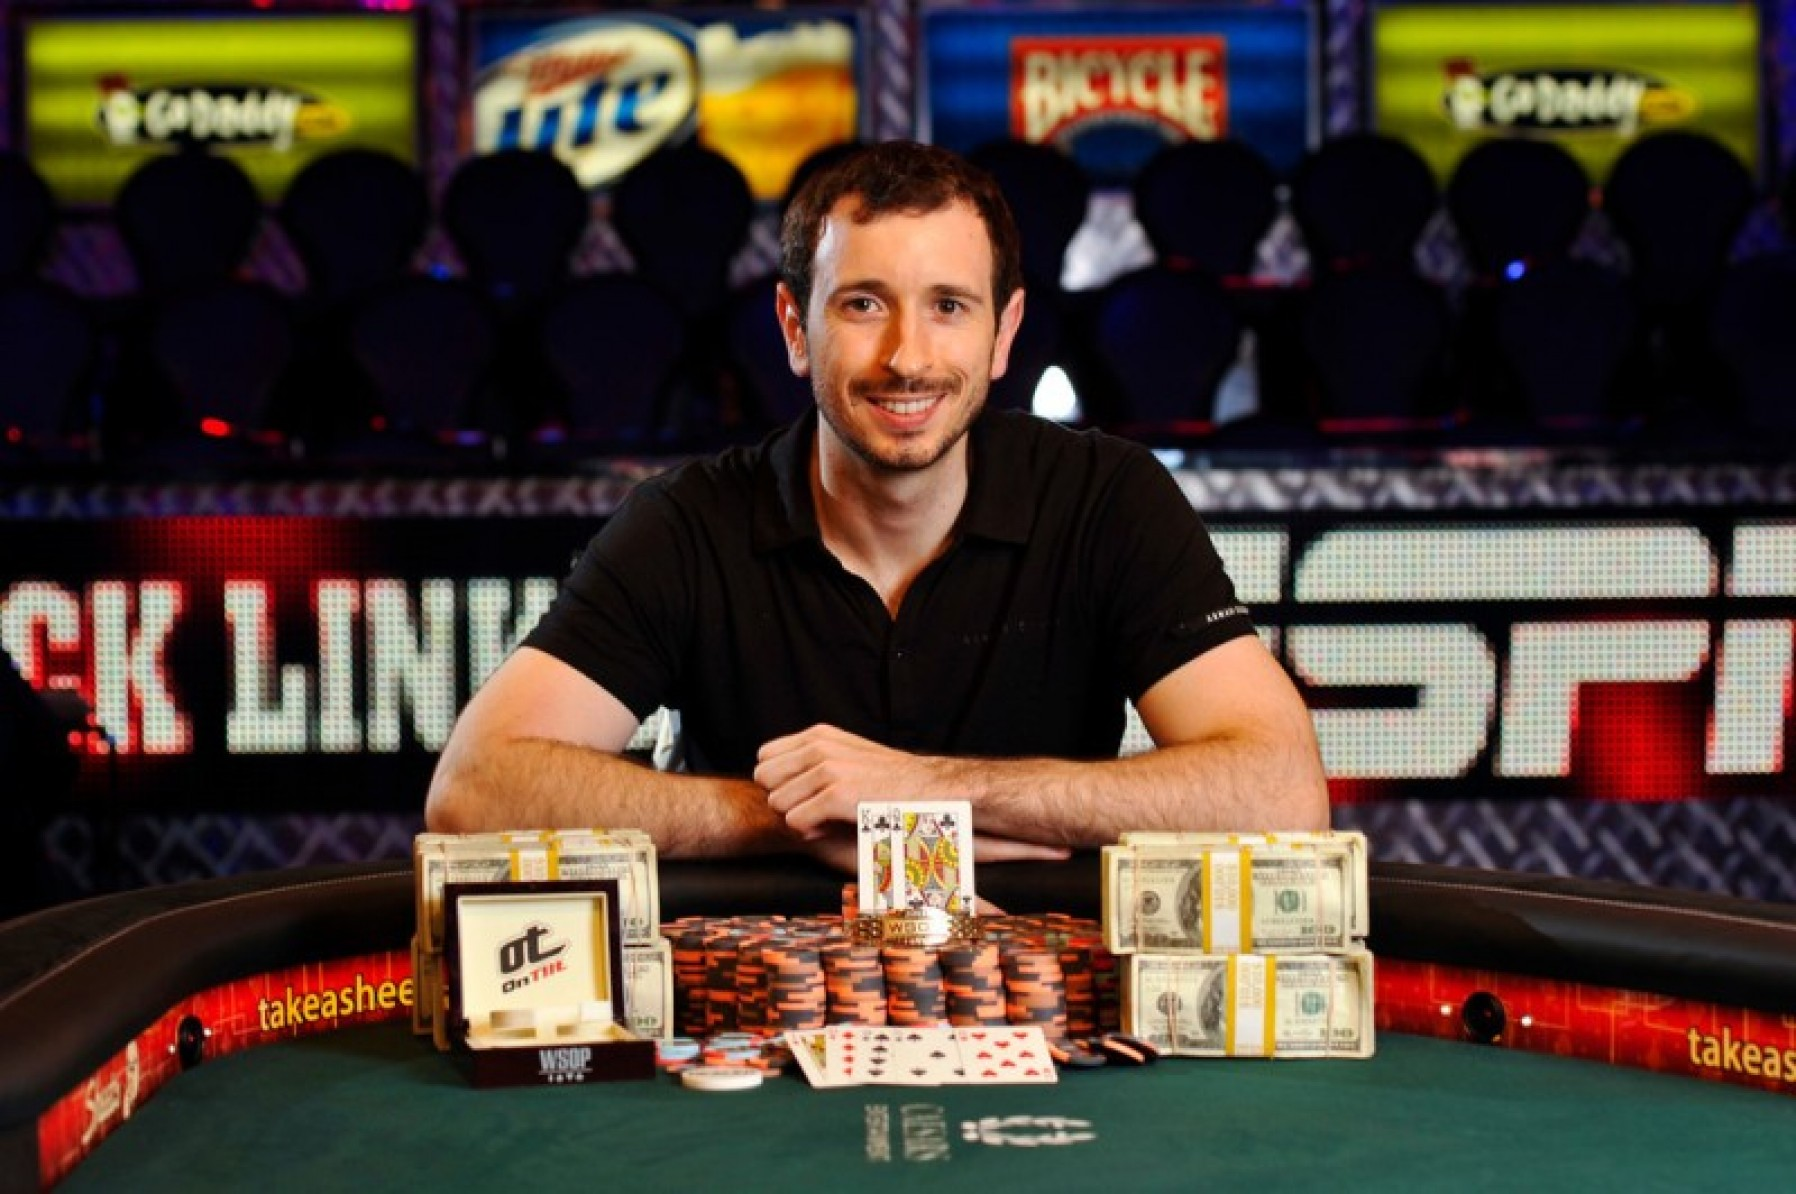 Brian-Rast-2011-WSOP-Event-55 (1)